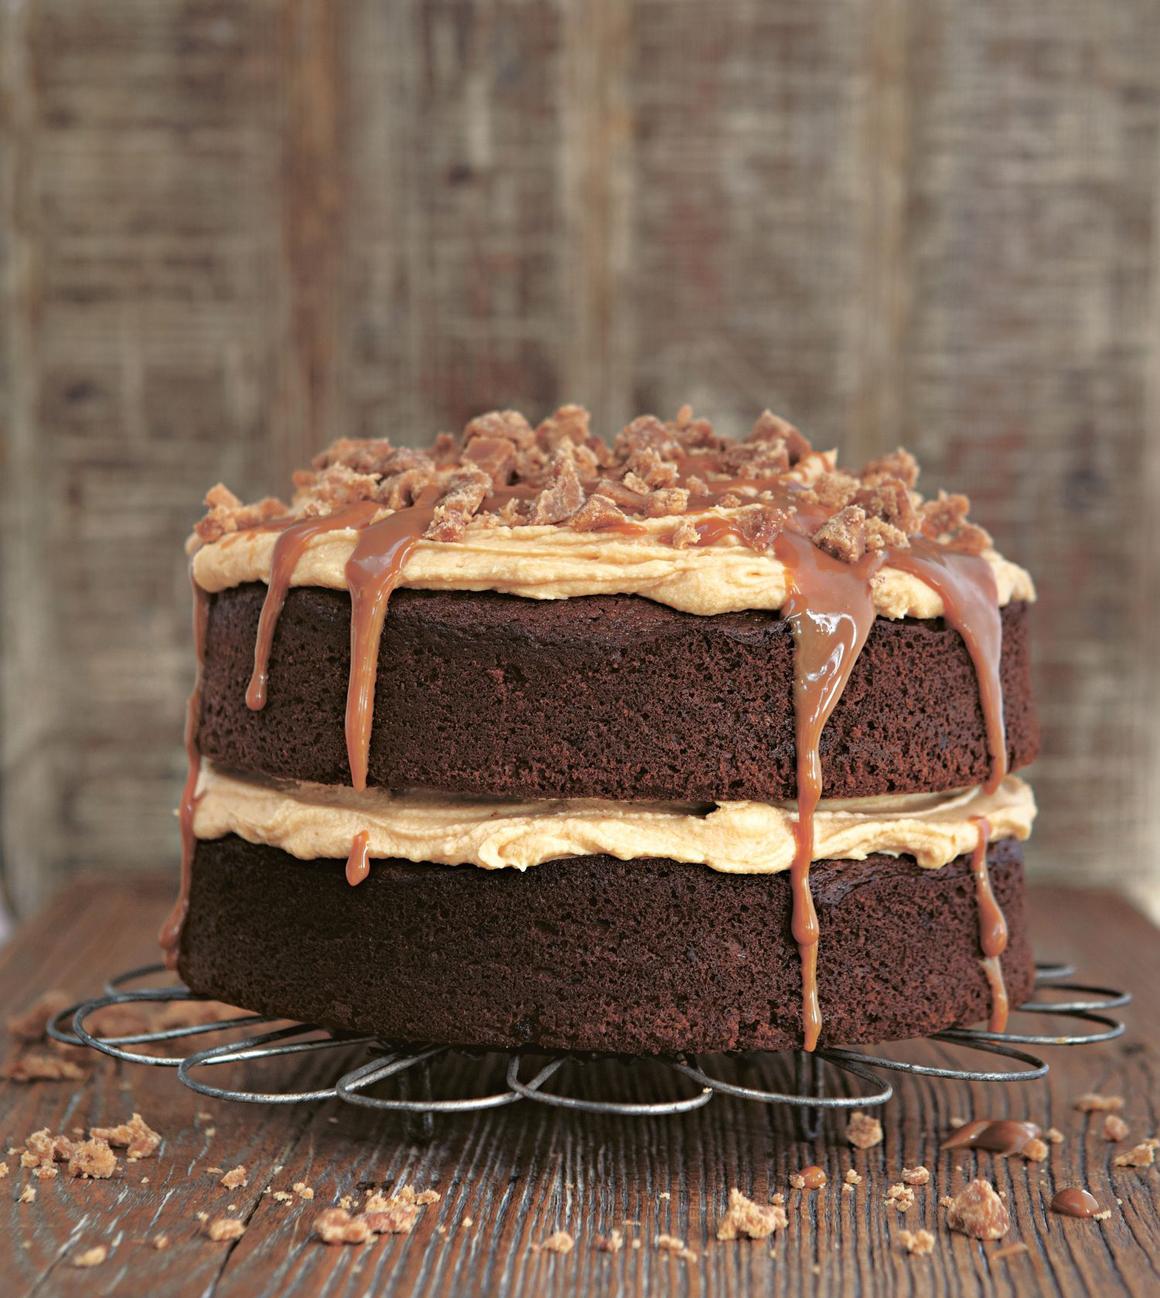 Glorious-Sticky-Toffee-Cake-1160x1298